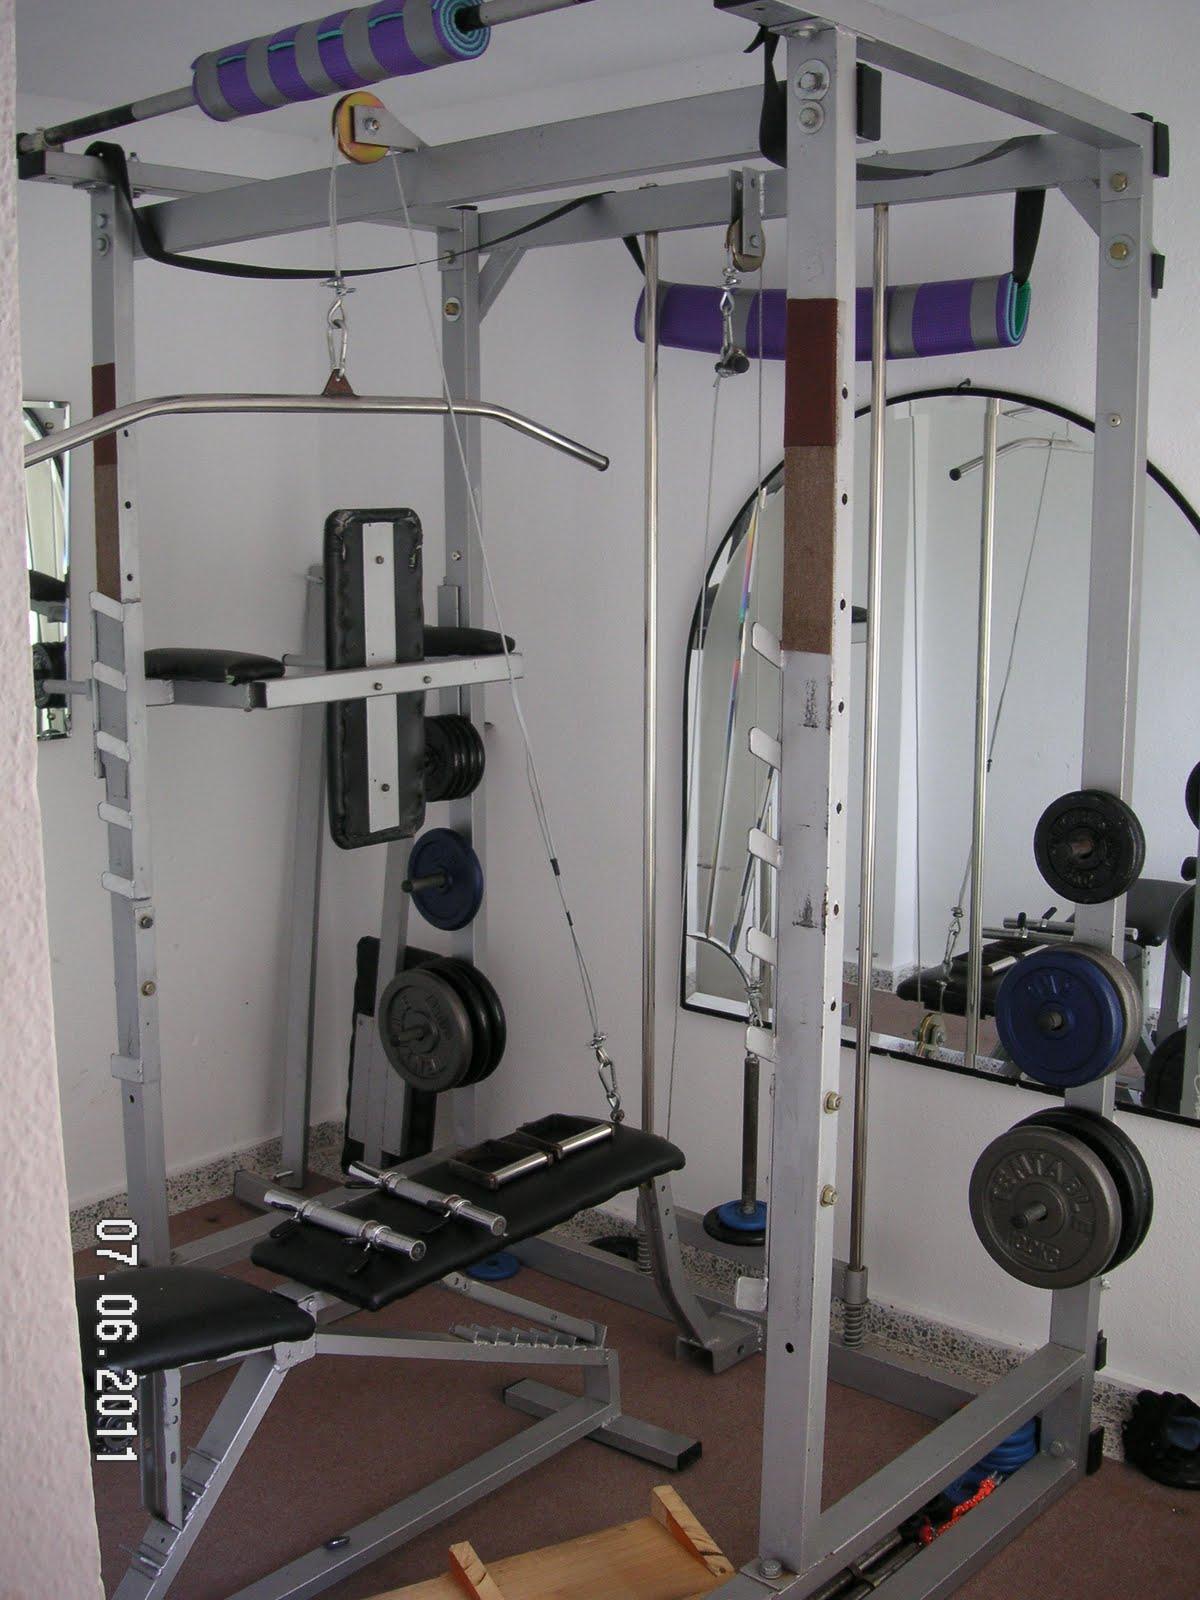 Gimnasio completo en casa detalles - Maquinas para gimnasio en casa ...